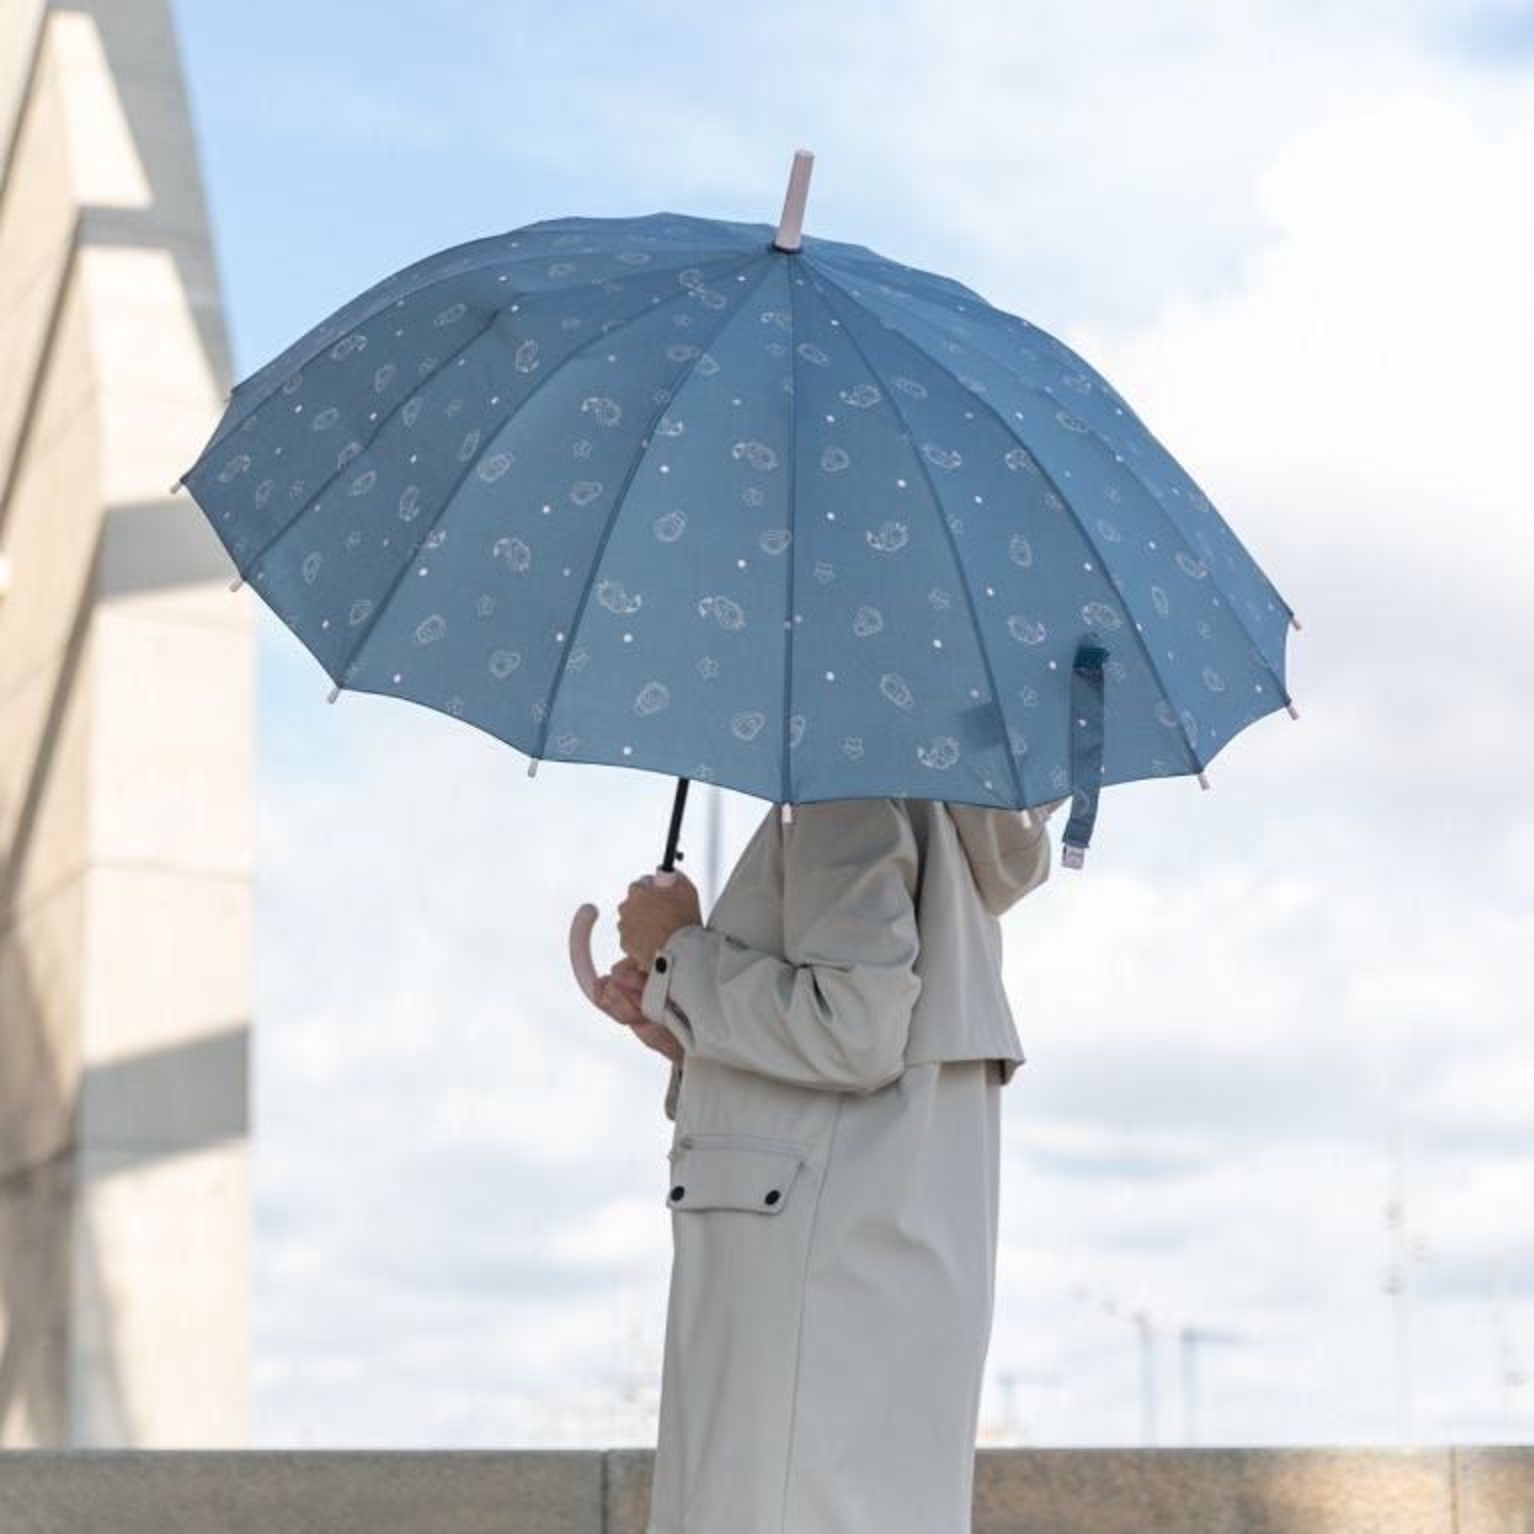 Guarda-chuva grande azul - Estampado de abacates